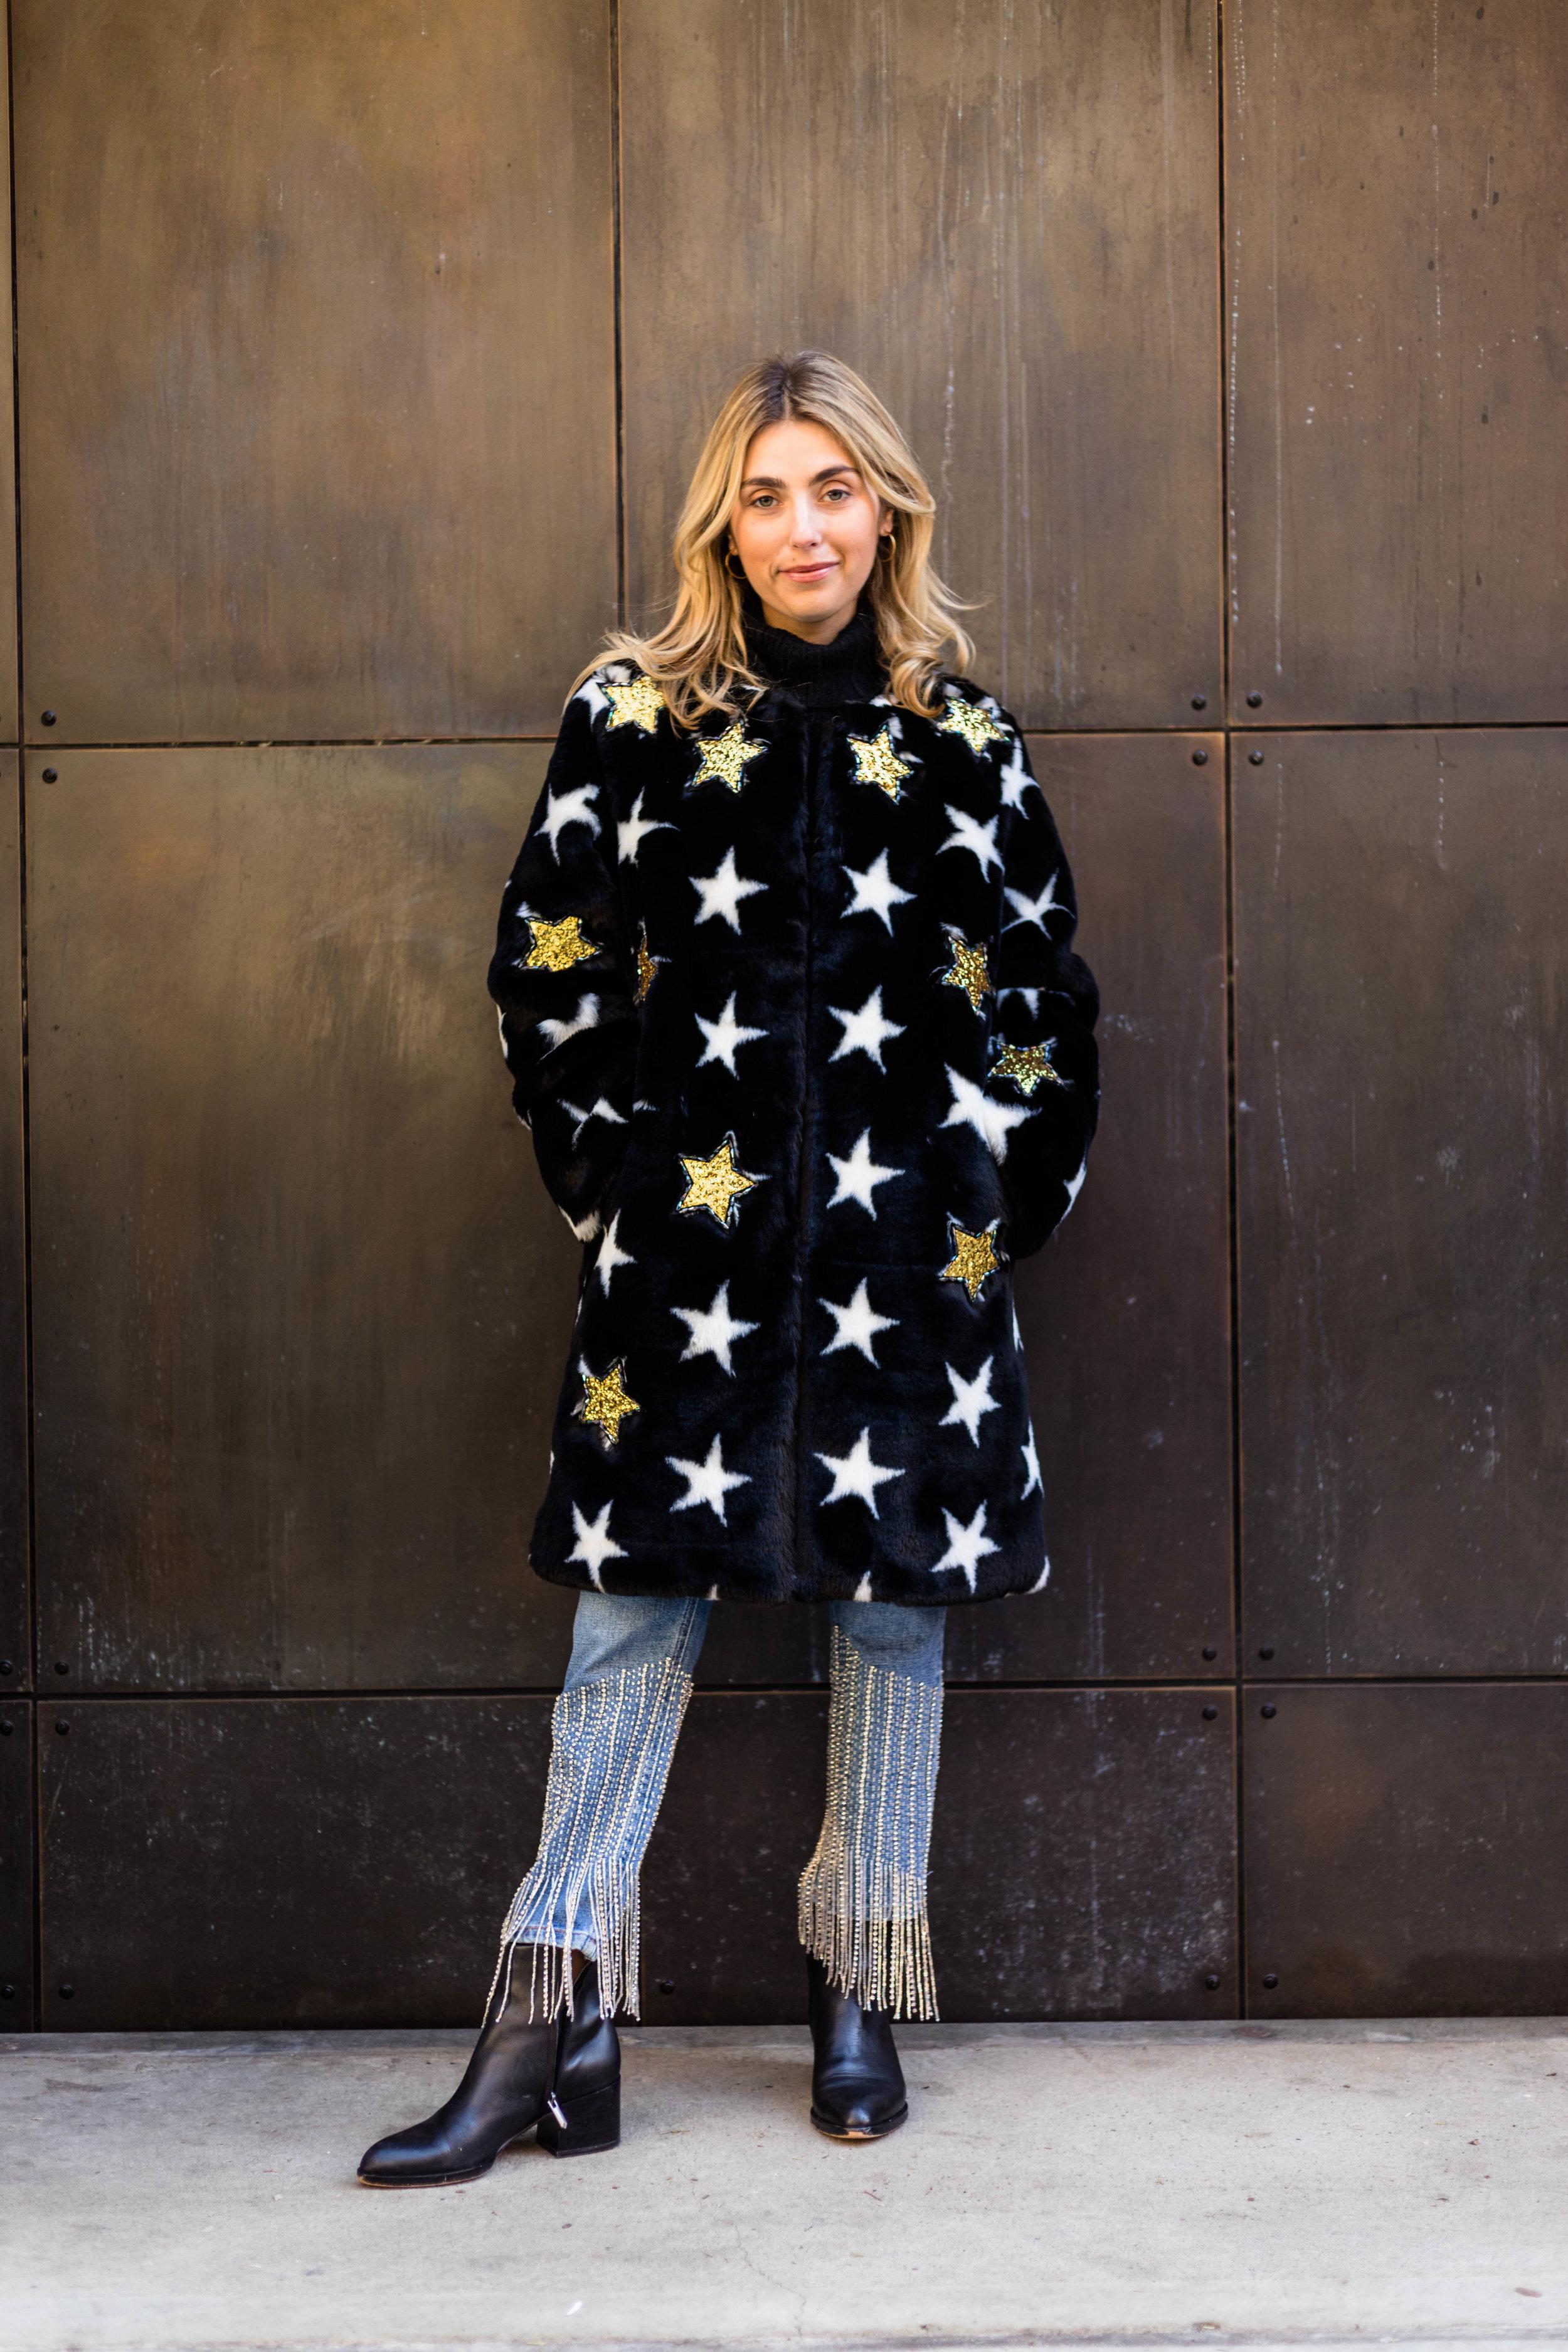 CHARLOTTE BICKLEY YIN 2MY YANG SISTER FASHION BLOGGERS NYC SEEING STARS POST